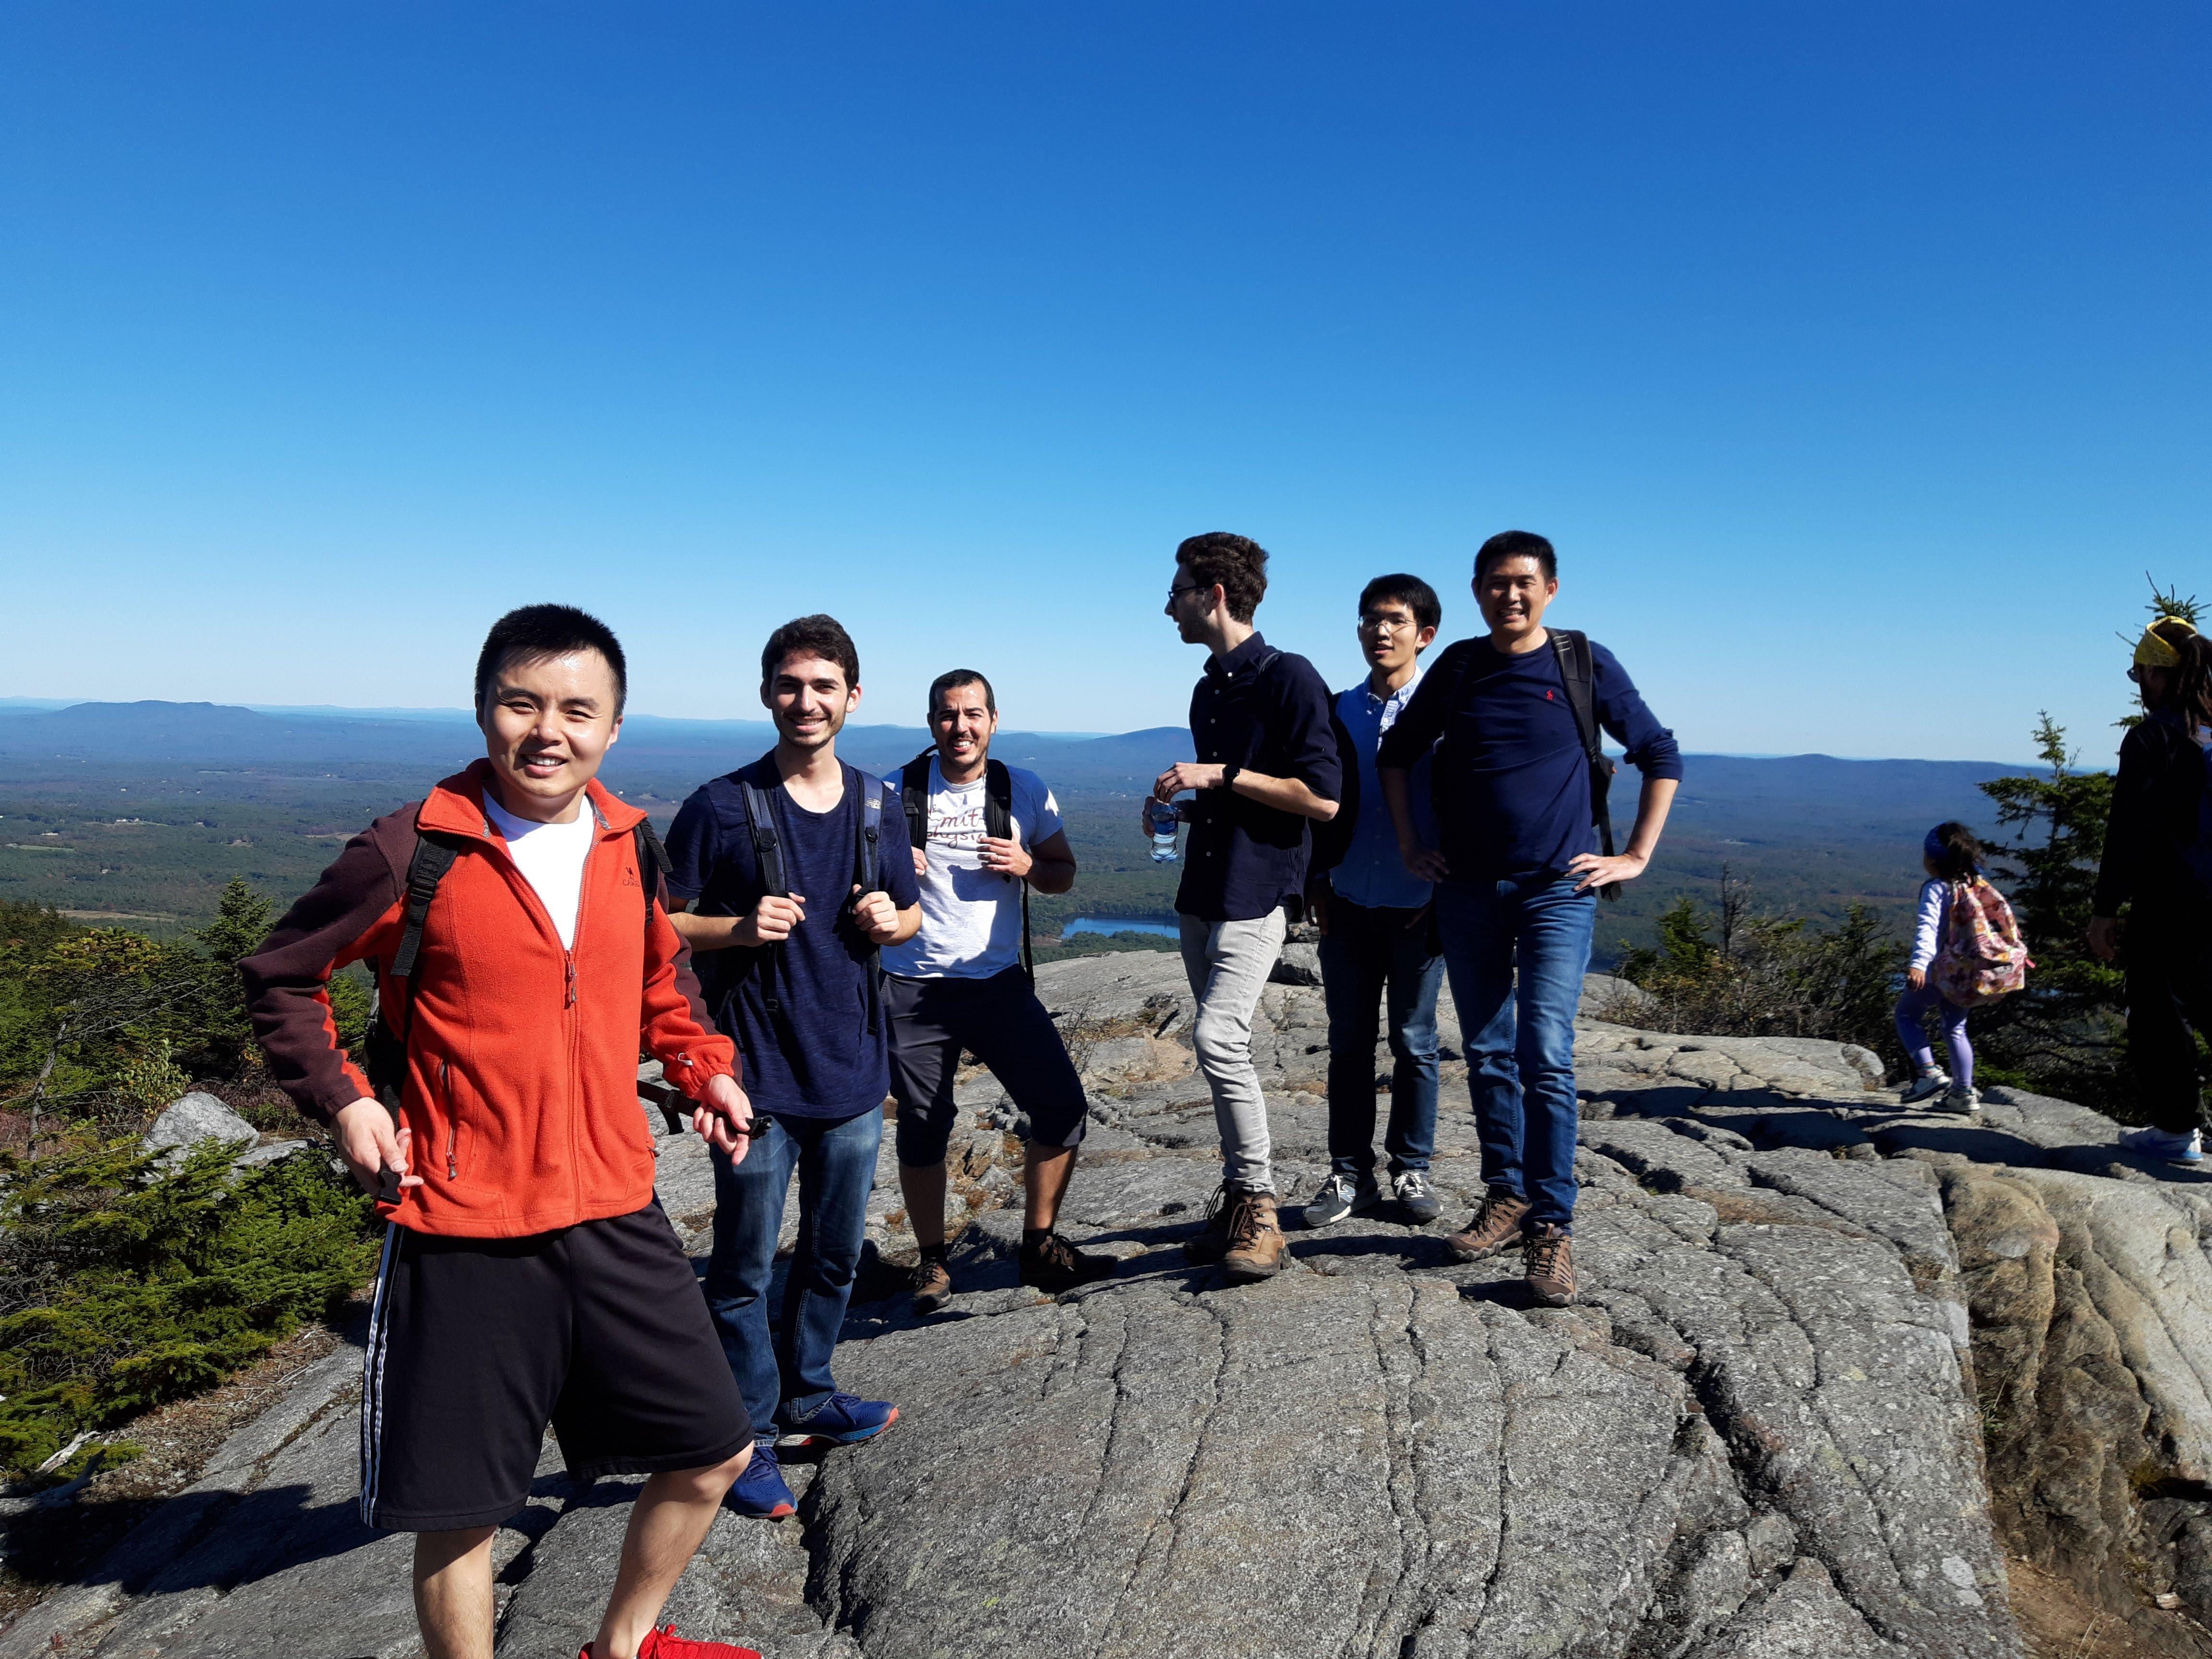 Group hike @ Mount Monadnock (Oct '19)